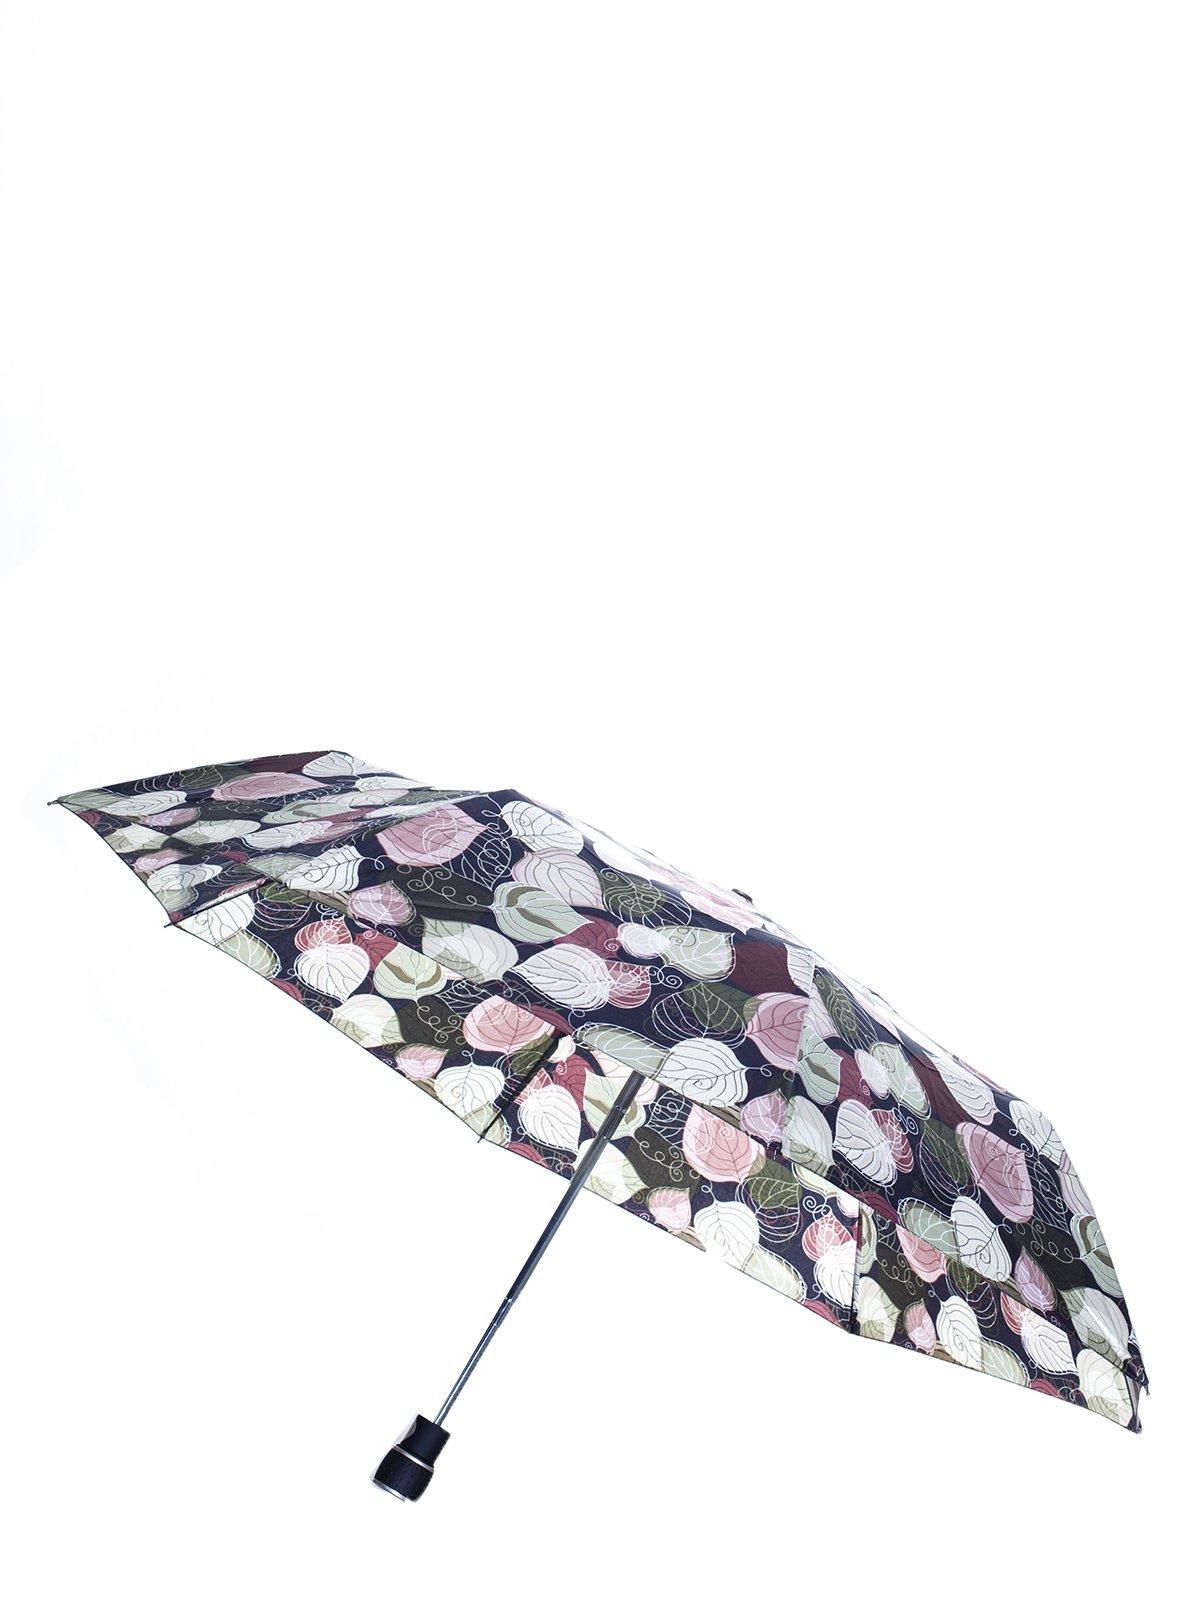 Зонт-полуавтомат | 2601530 | фото 2